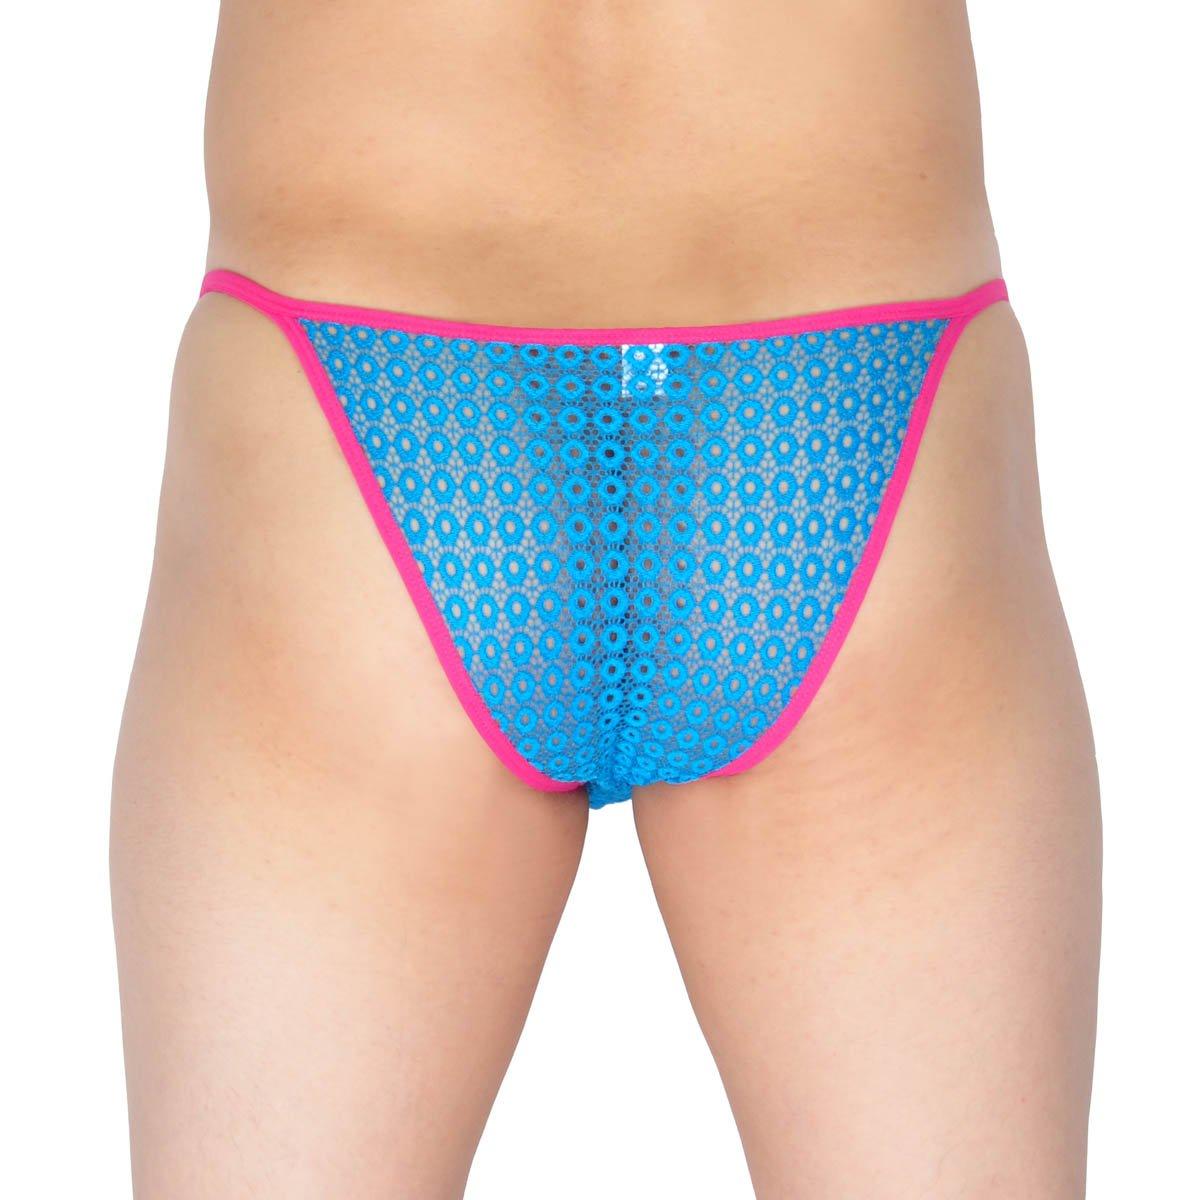 Lemja Mens Hollow Bikini Briefs Lace Mini Brief Pouch Jacquard Male Underwear Rope Pants